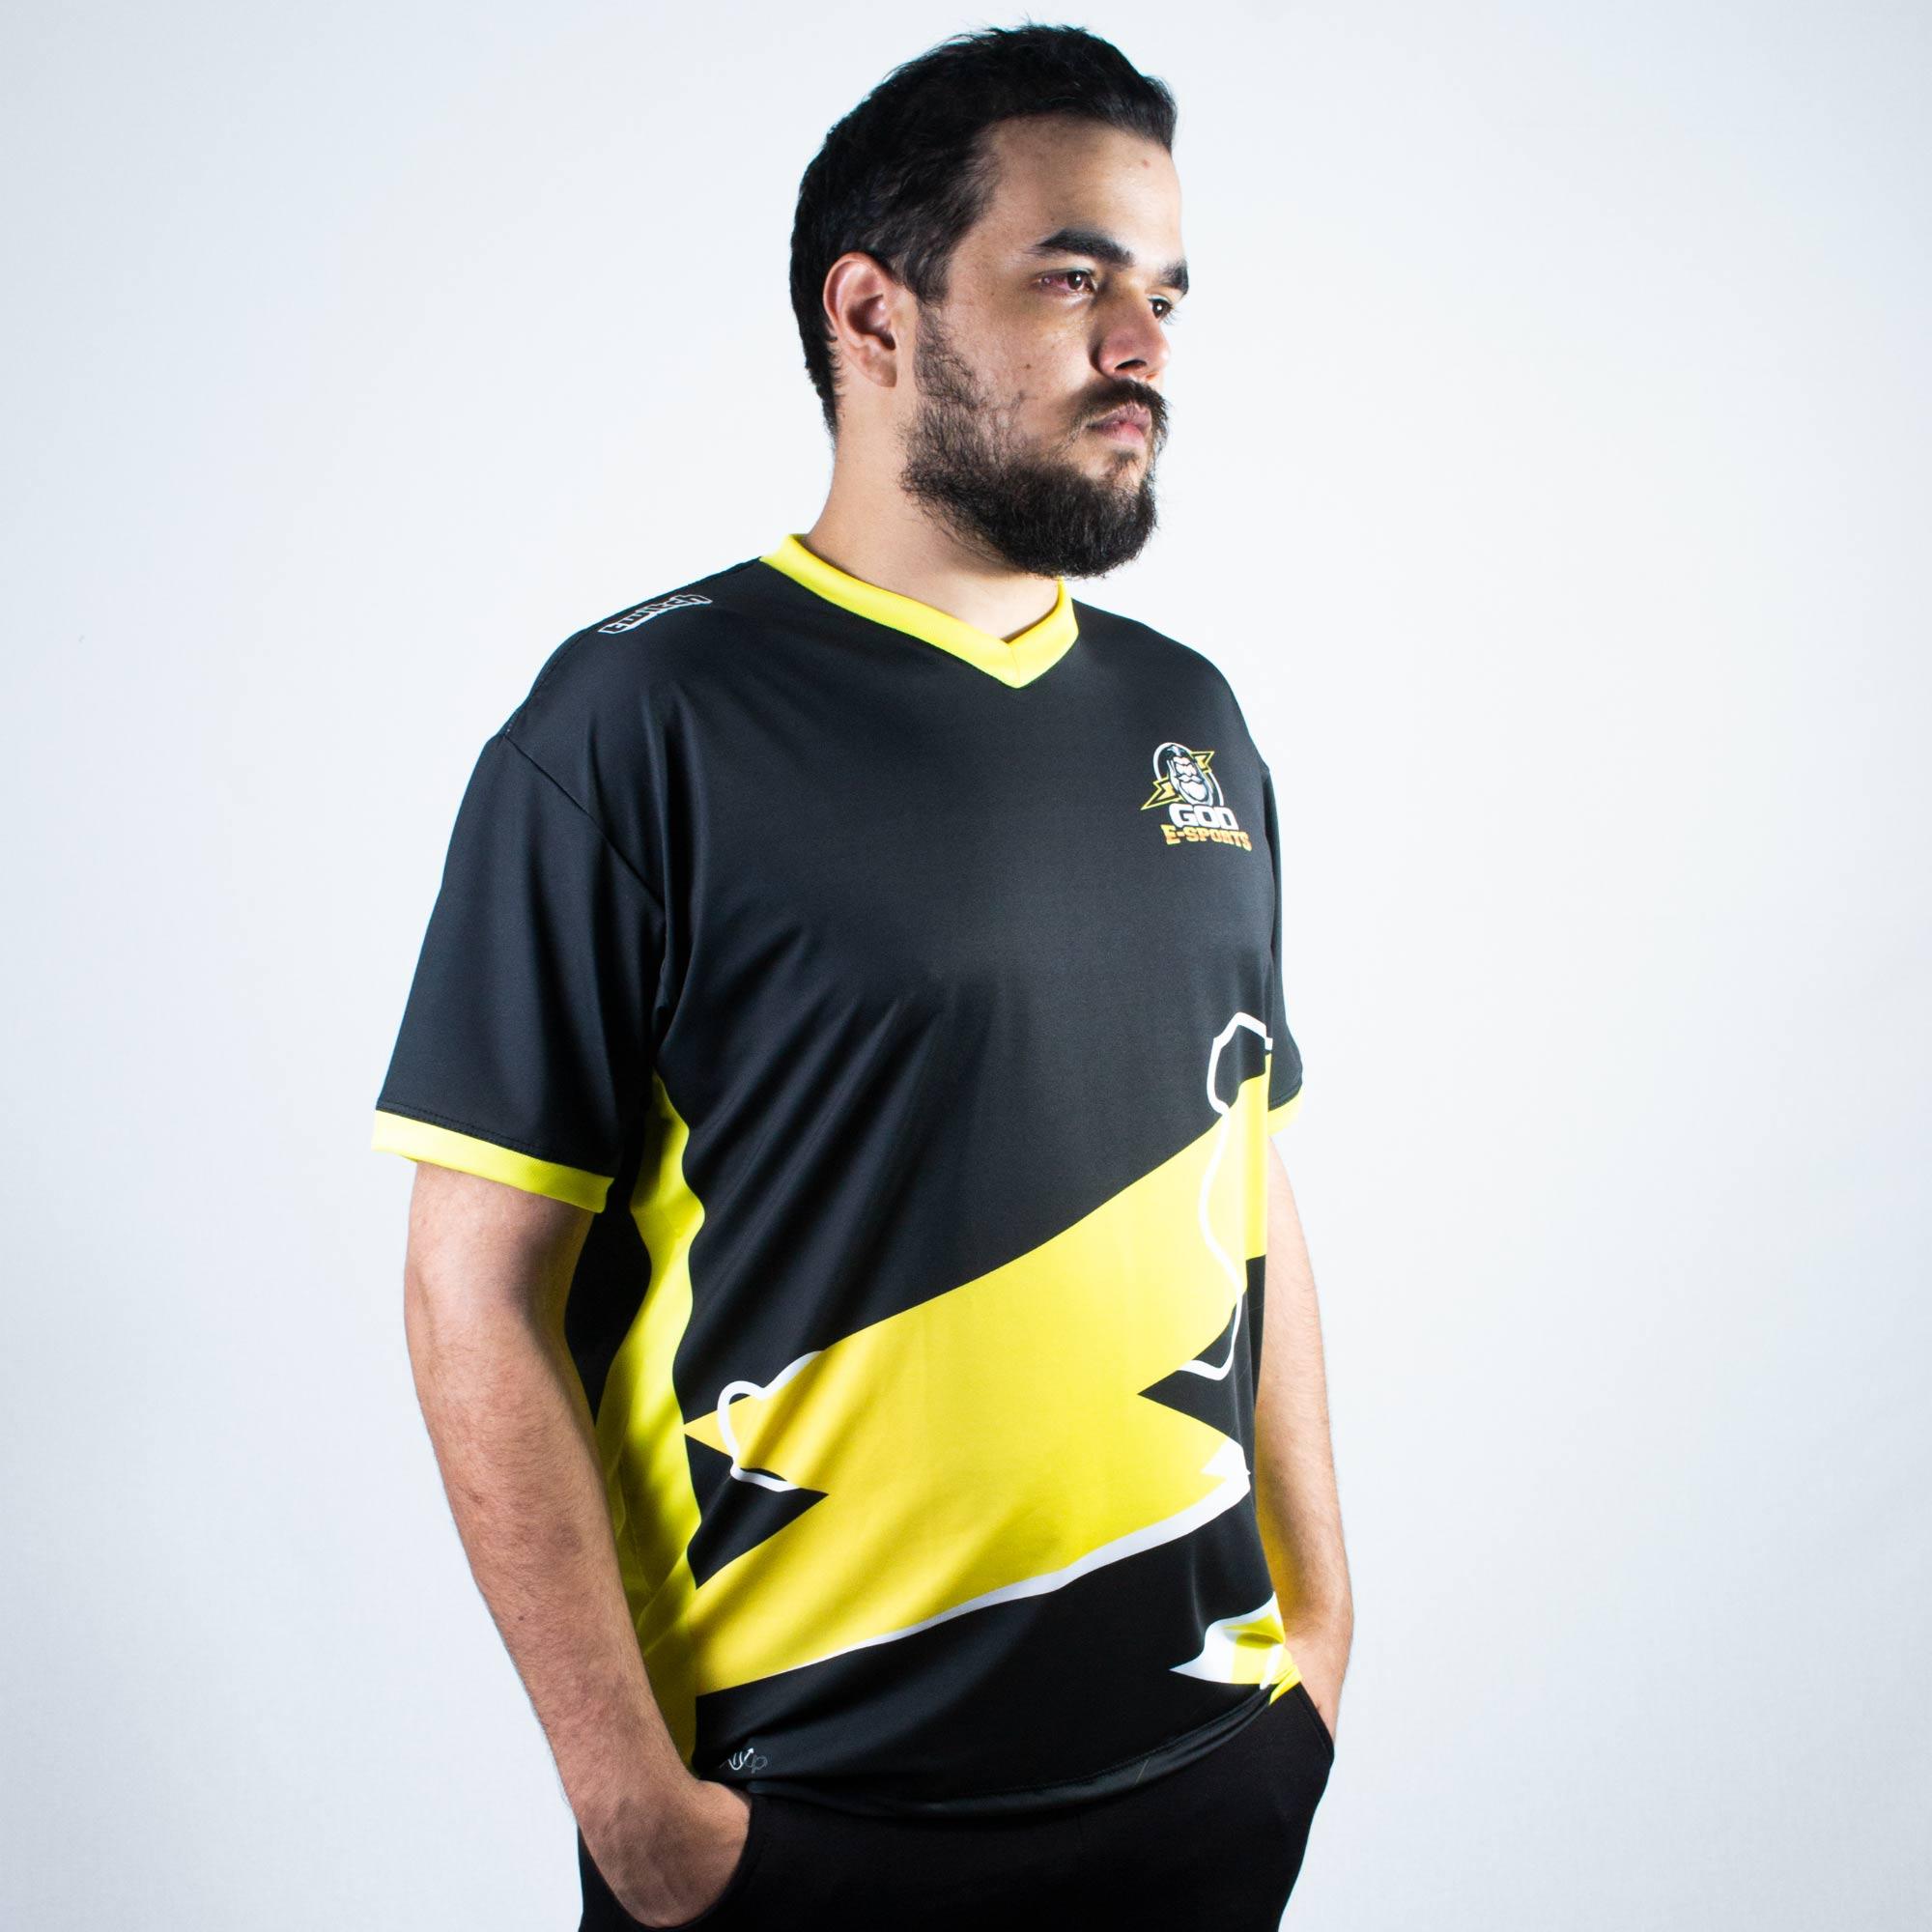 Camiseta Jersey God Esports Torcedor Oficial Preta